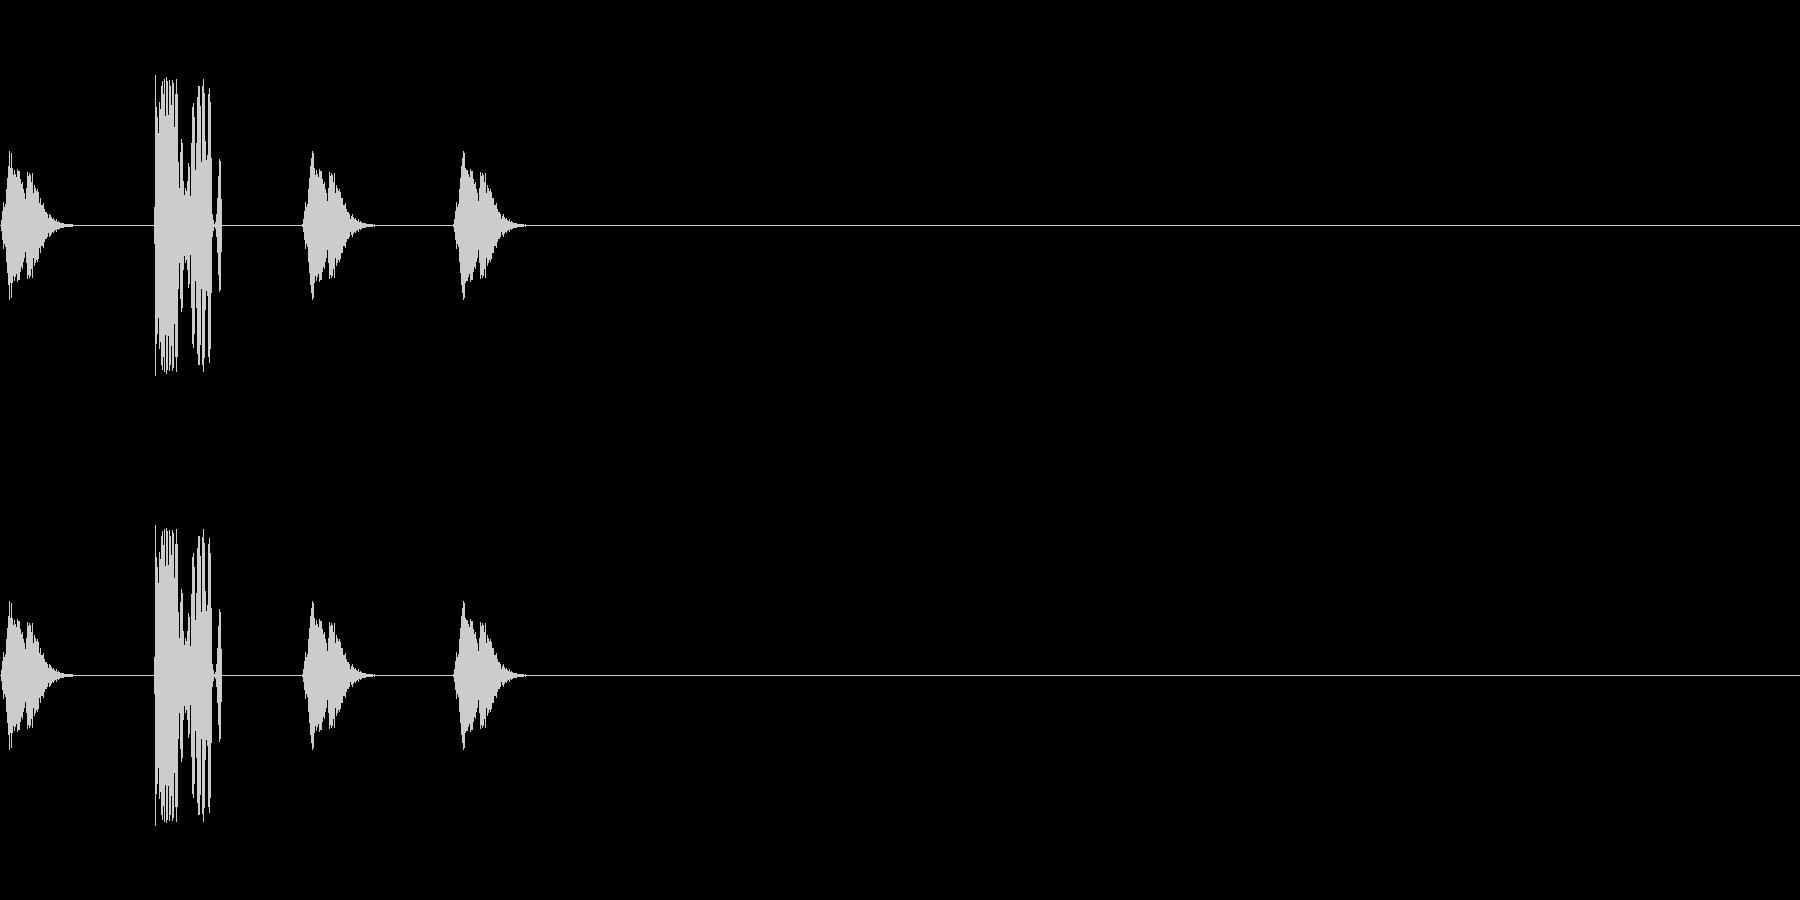 DJスクラッチ/ターンテーブル/E-14の未再生の波形